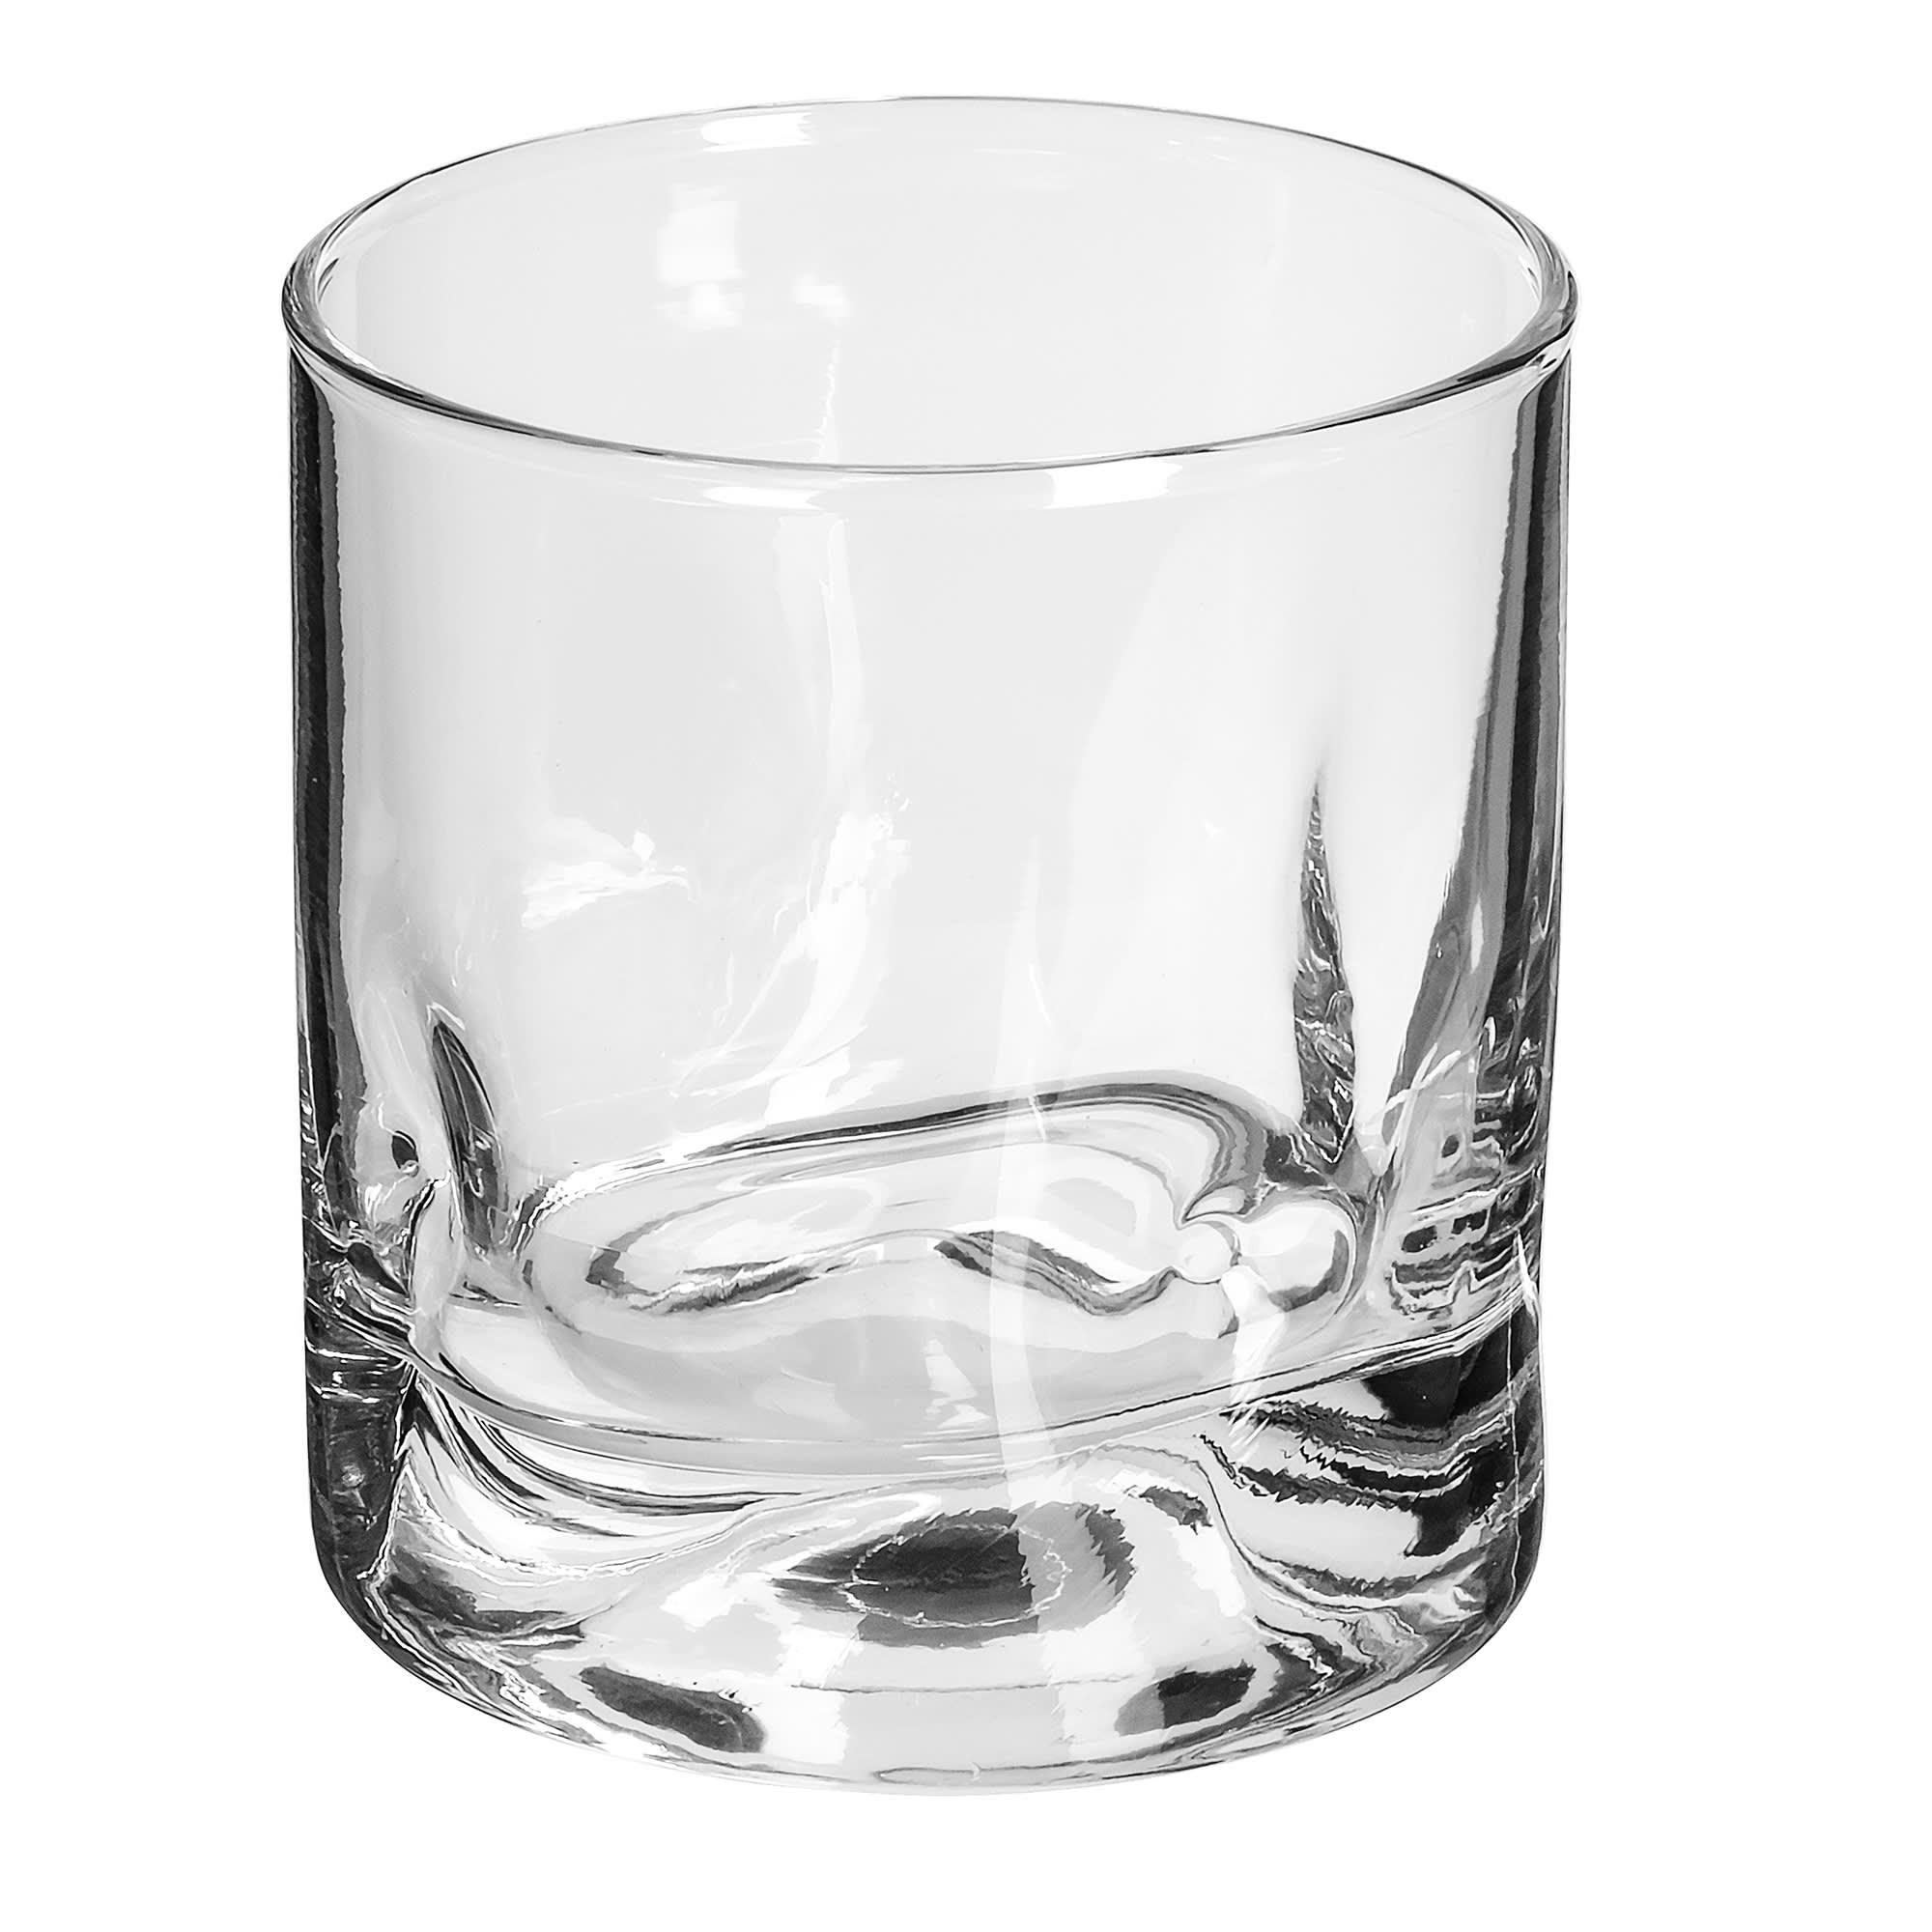 Libbey 1767580 8-oz Old Fashioned Glass - Impressions